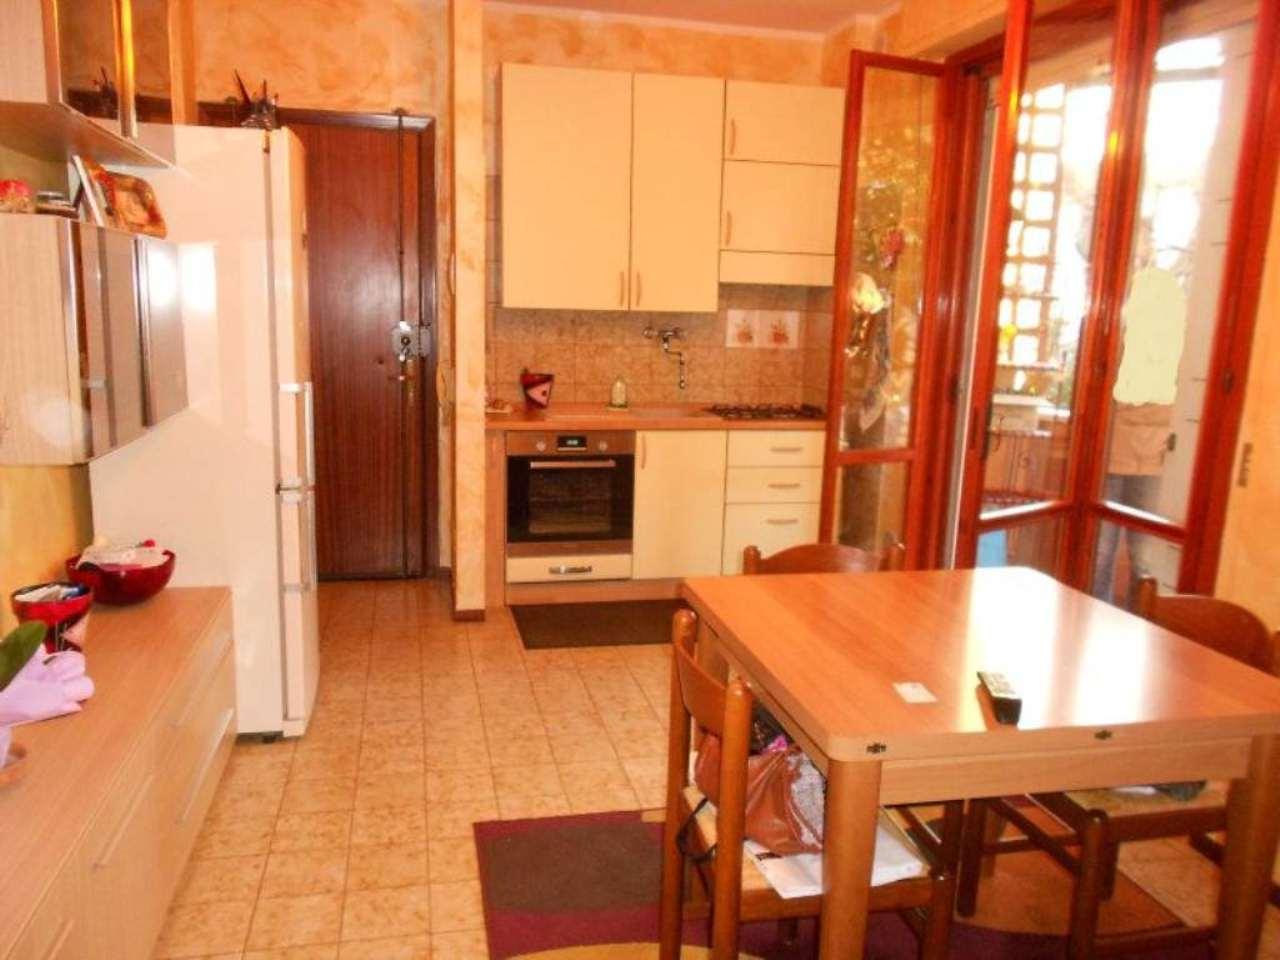 Bilocale Rimini Via Via Rossini 9